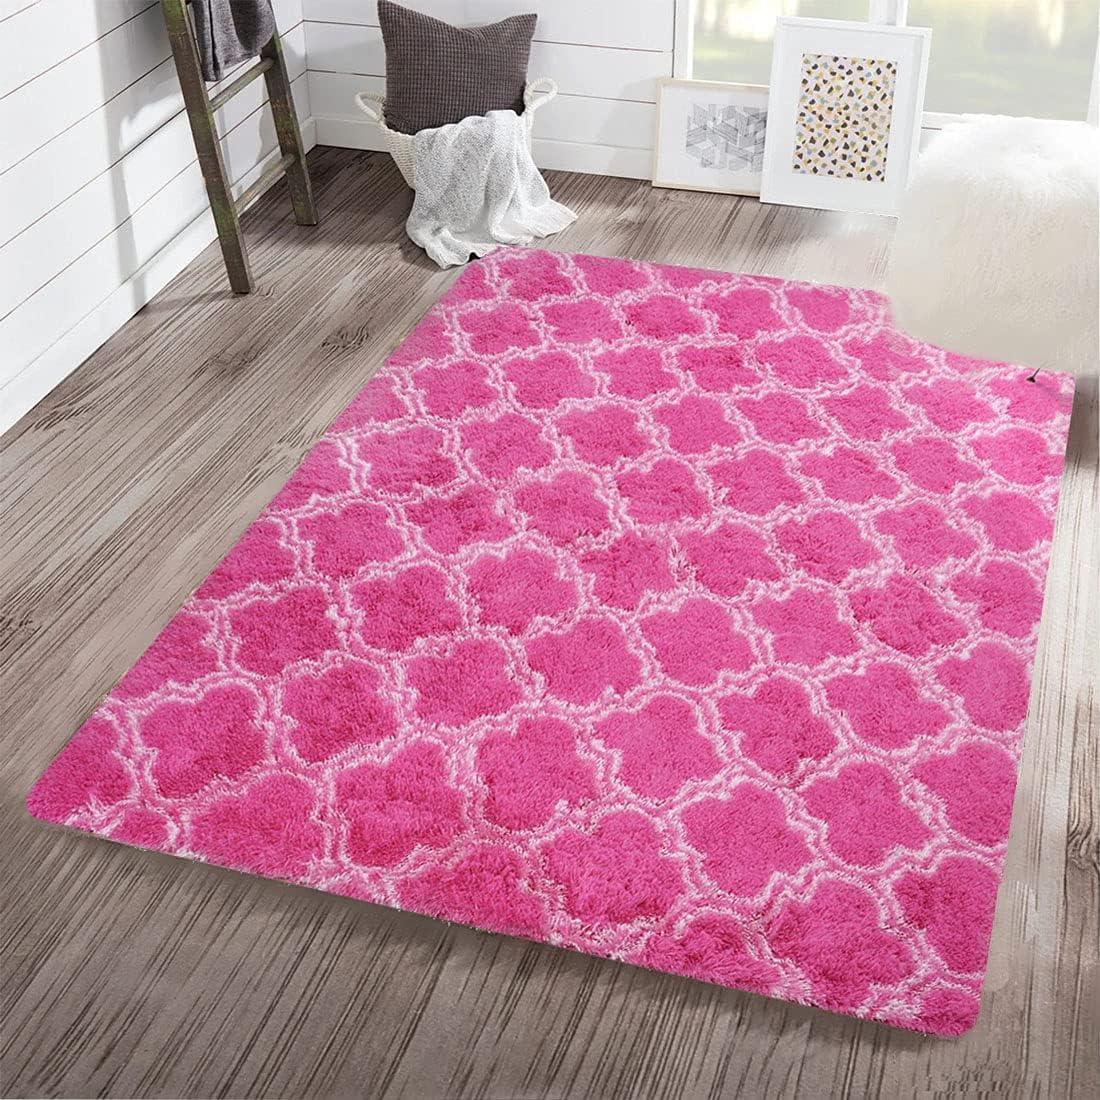 WHOW Sale special price Super Soft Area Rug Modern Fluffy 25% OFF Carpet Shag Living Room